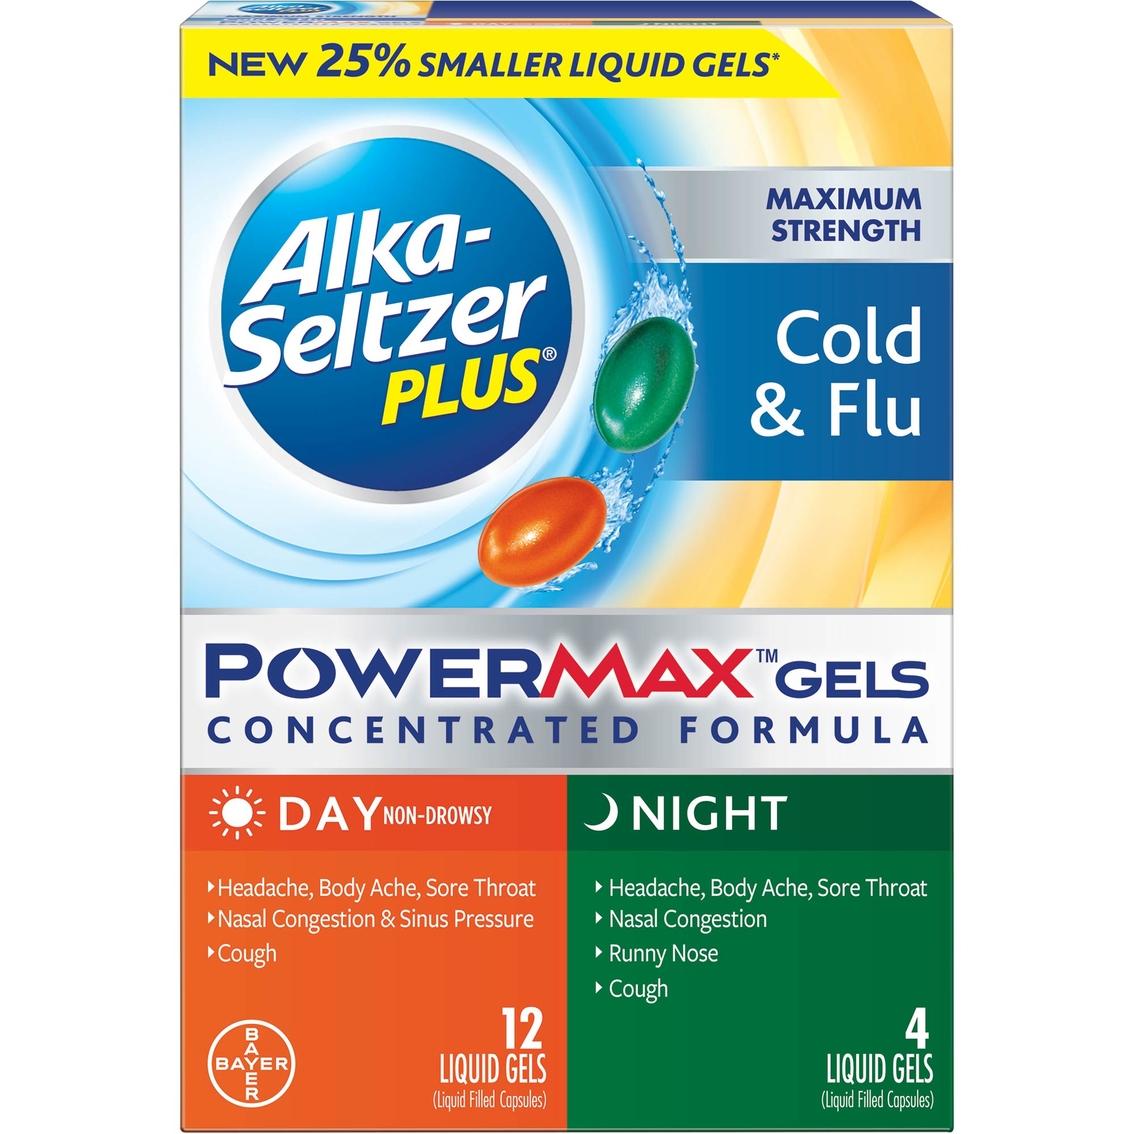 Alka-seltzer Plus Maximum Strength Cold & Flu Powermax ...